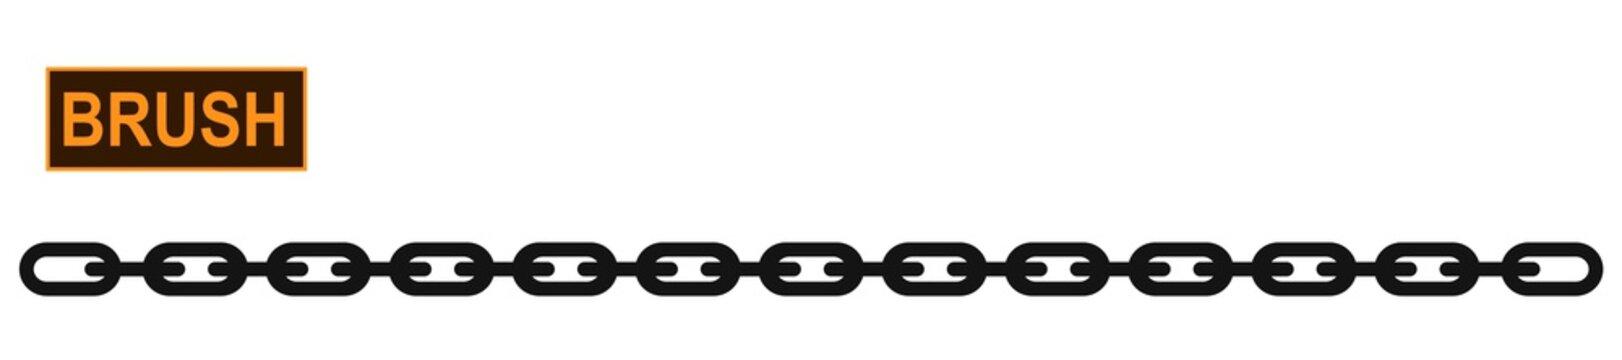 Metallic chain icon illustrator brush for fashion and digital illustration. Colorable customizable shackles.